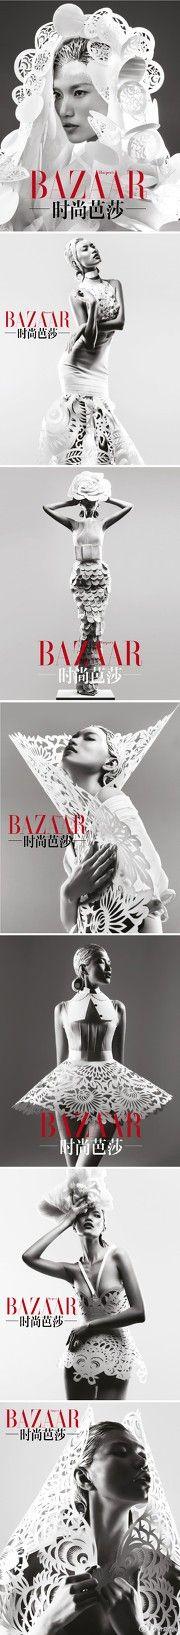 Chinese Bazaar ad. Paper cut fashion.